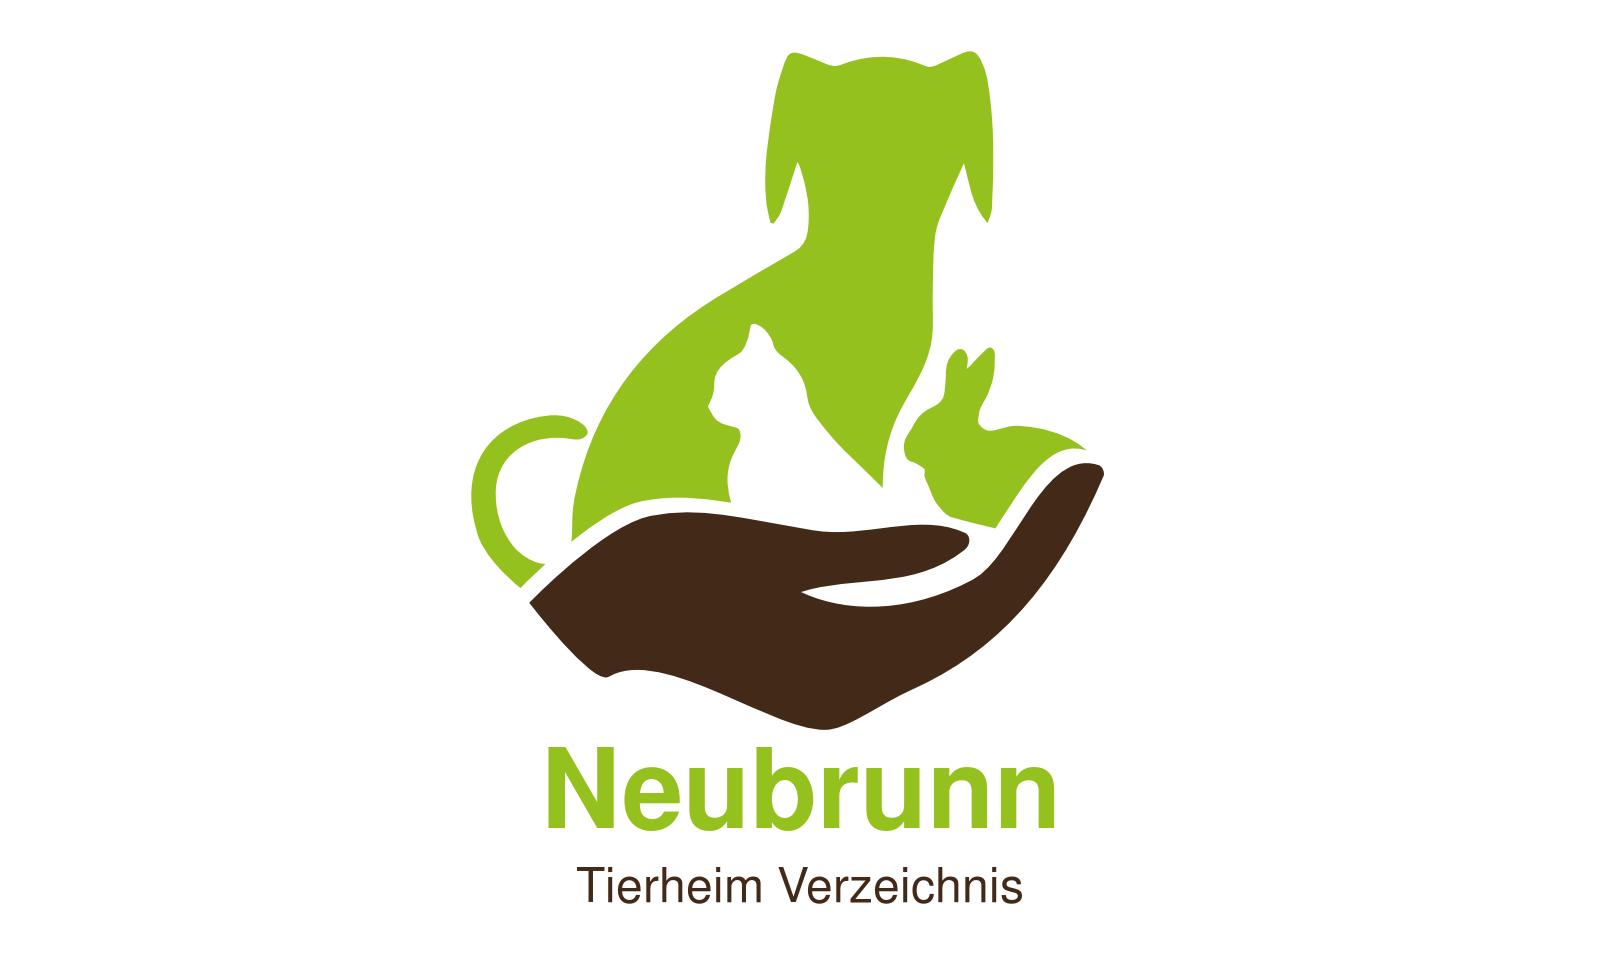 Tierheim Neubrunn